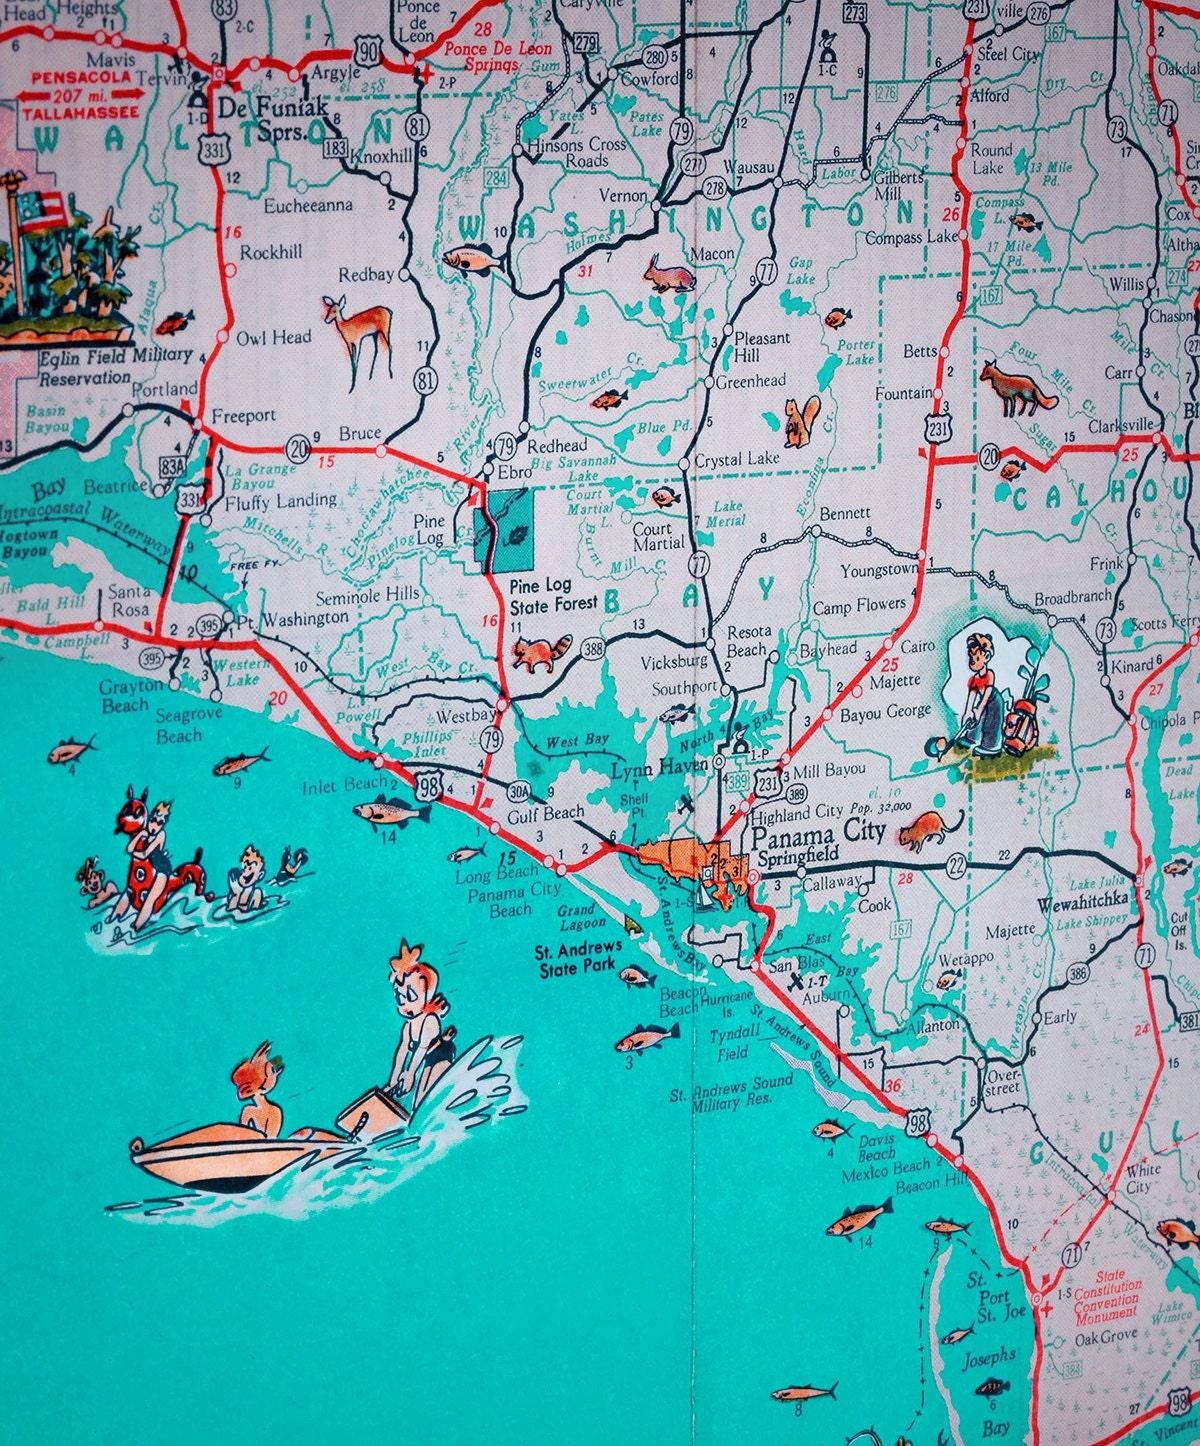 St Joe Florida Map.Panama City St Joe Florida Panhandle Beach Retro Map Print Etsy